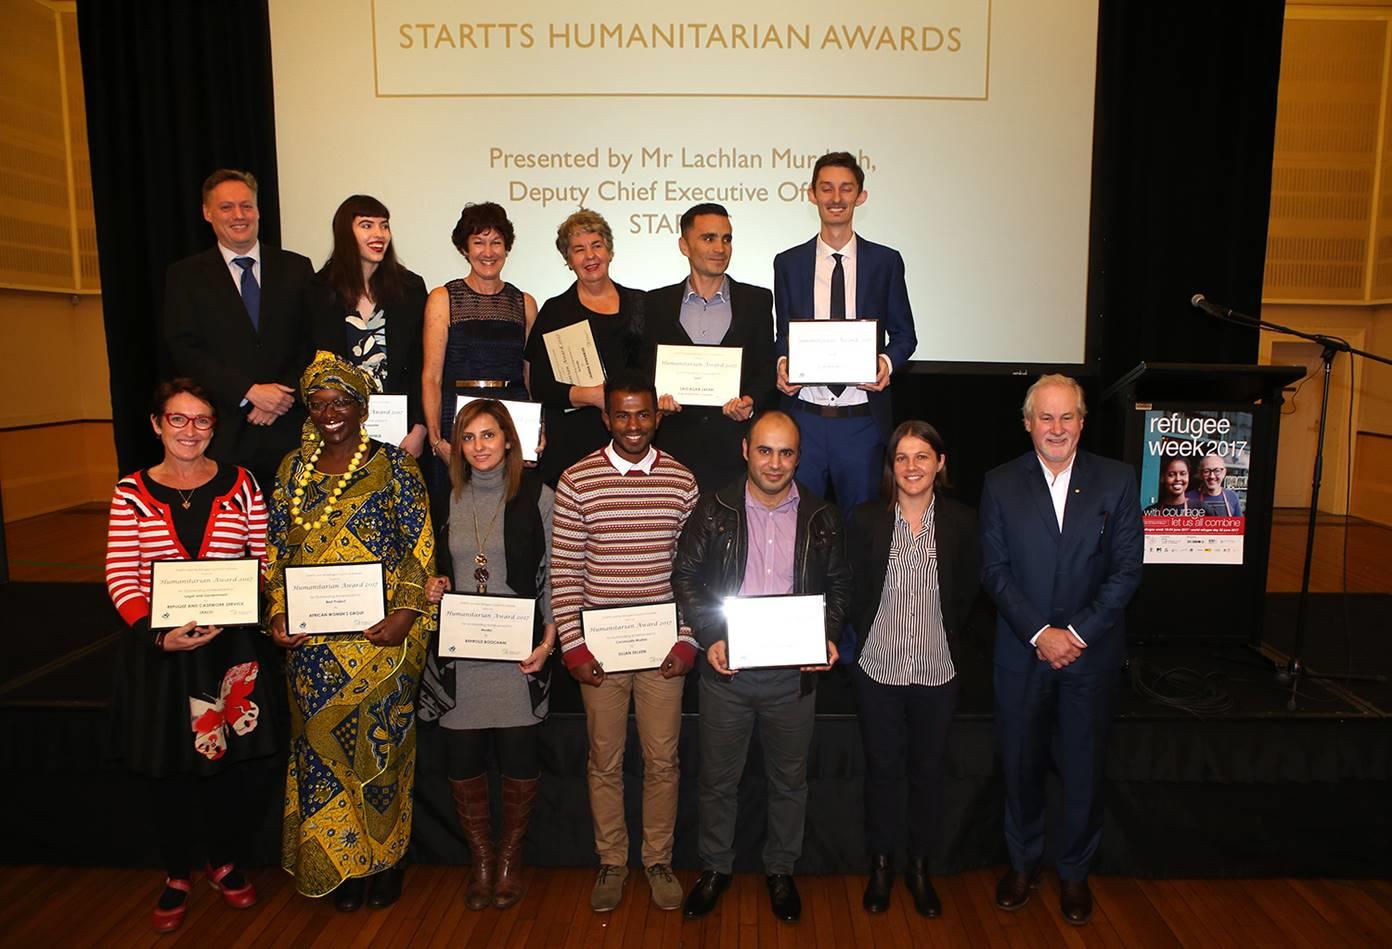 STARTTS Humanitarian Awards